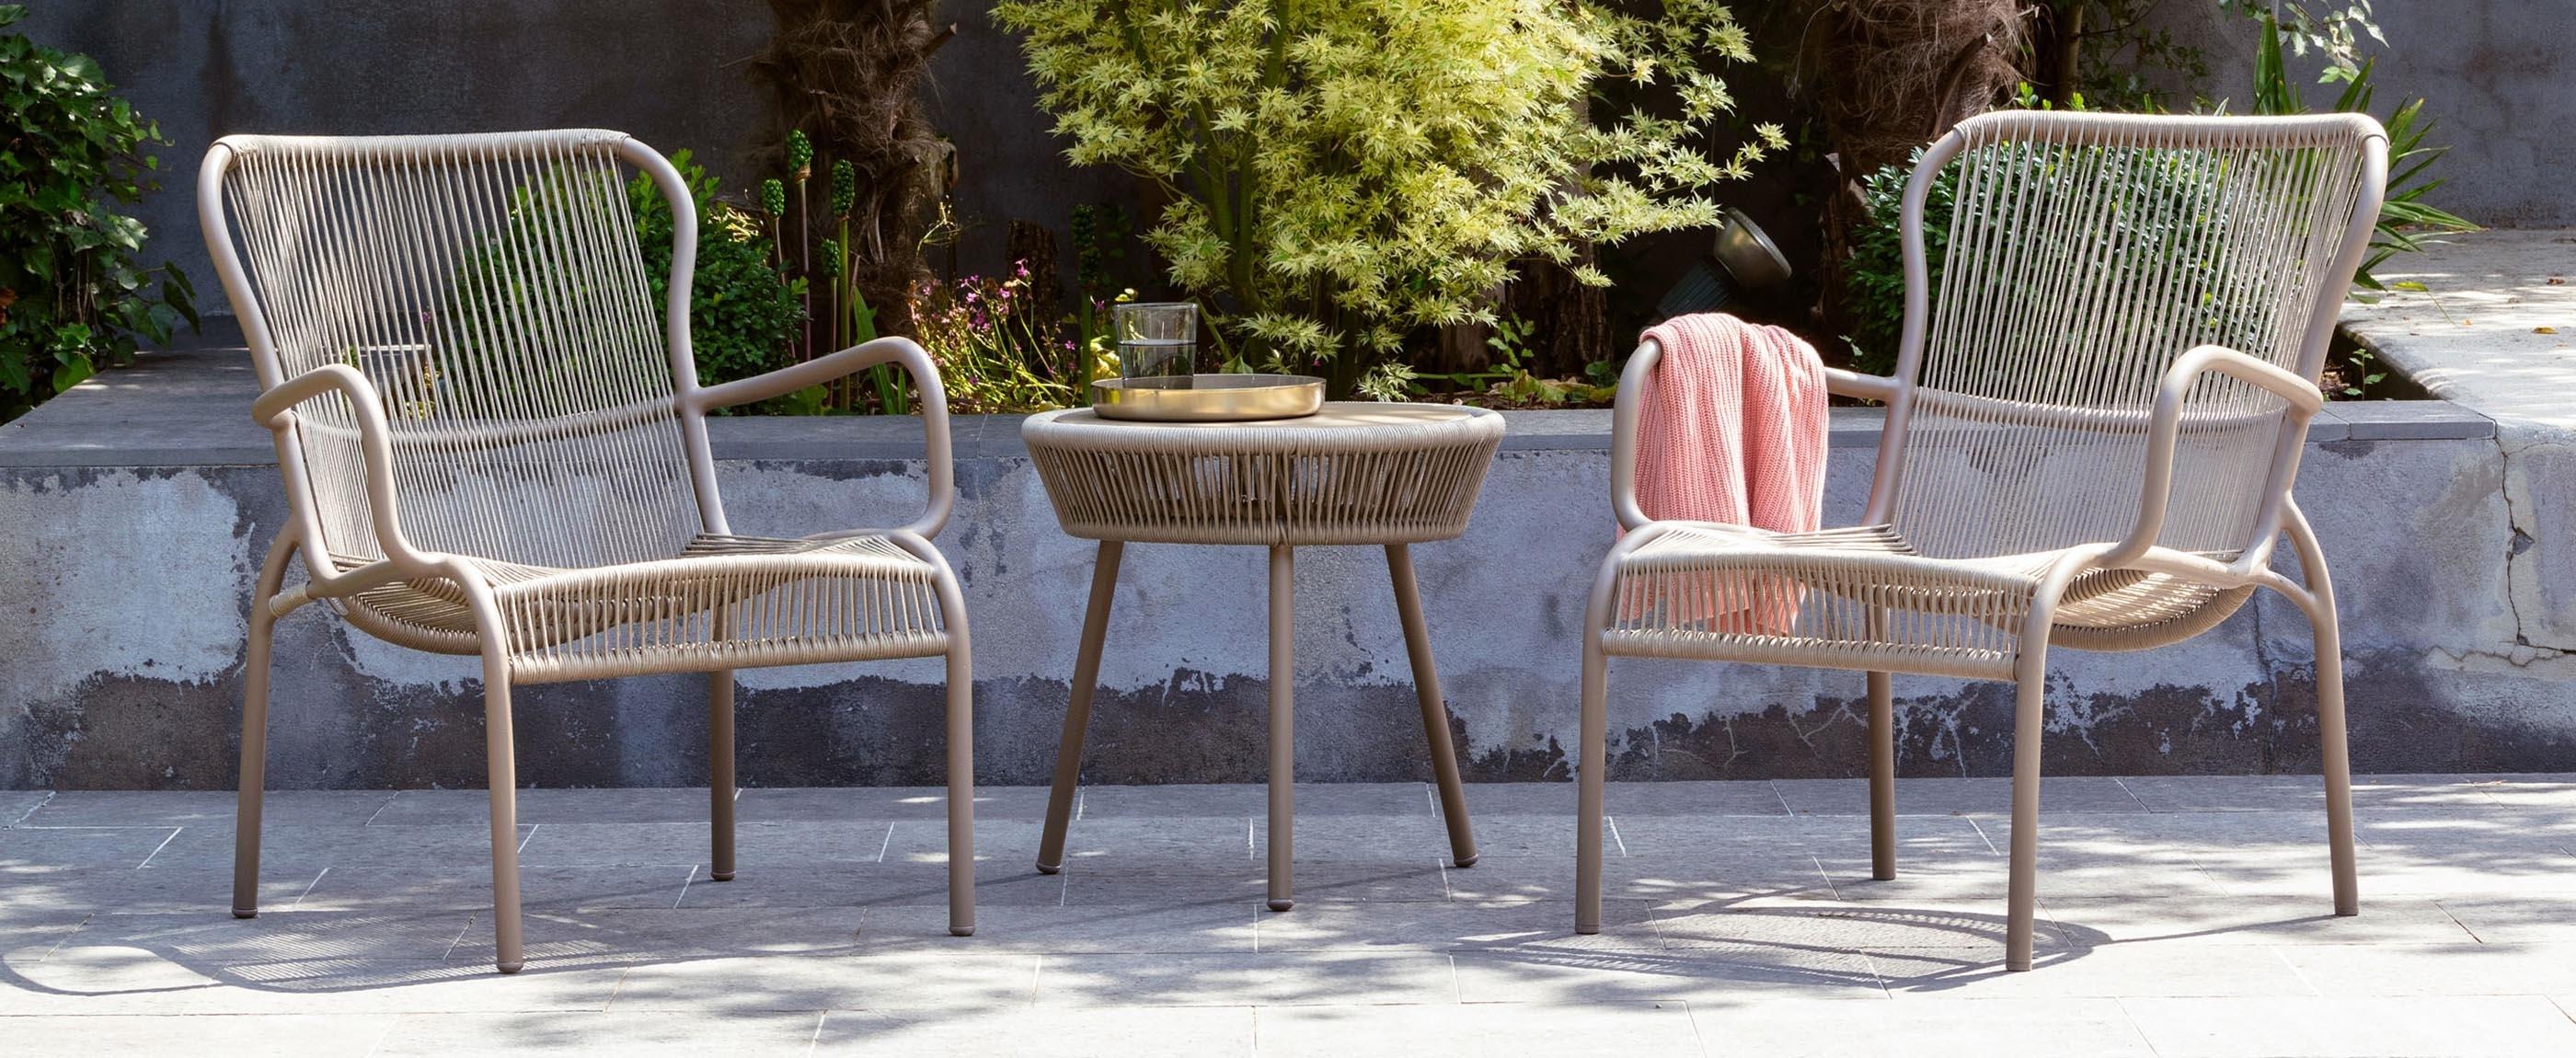 Outdoor Furniture Sale 15% Off